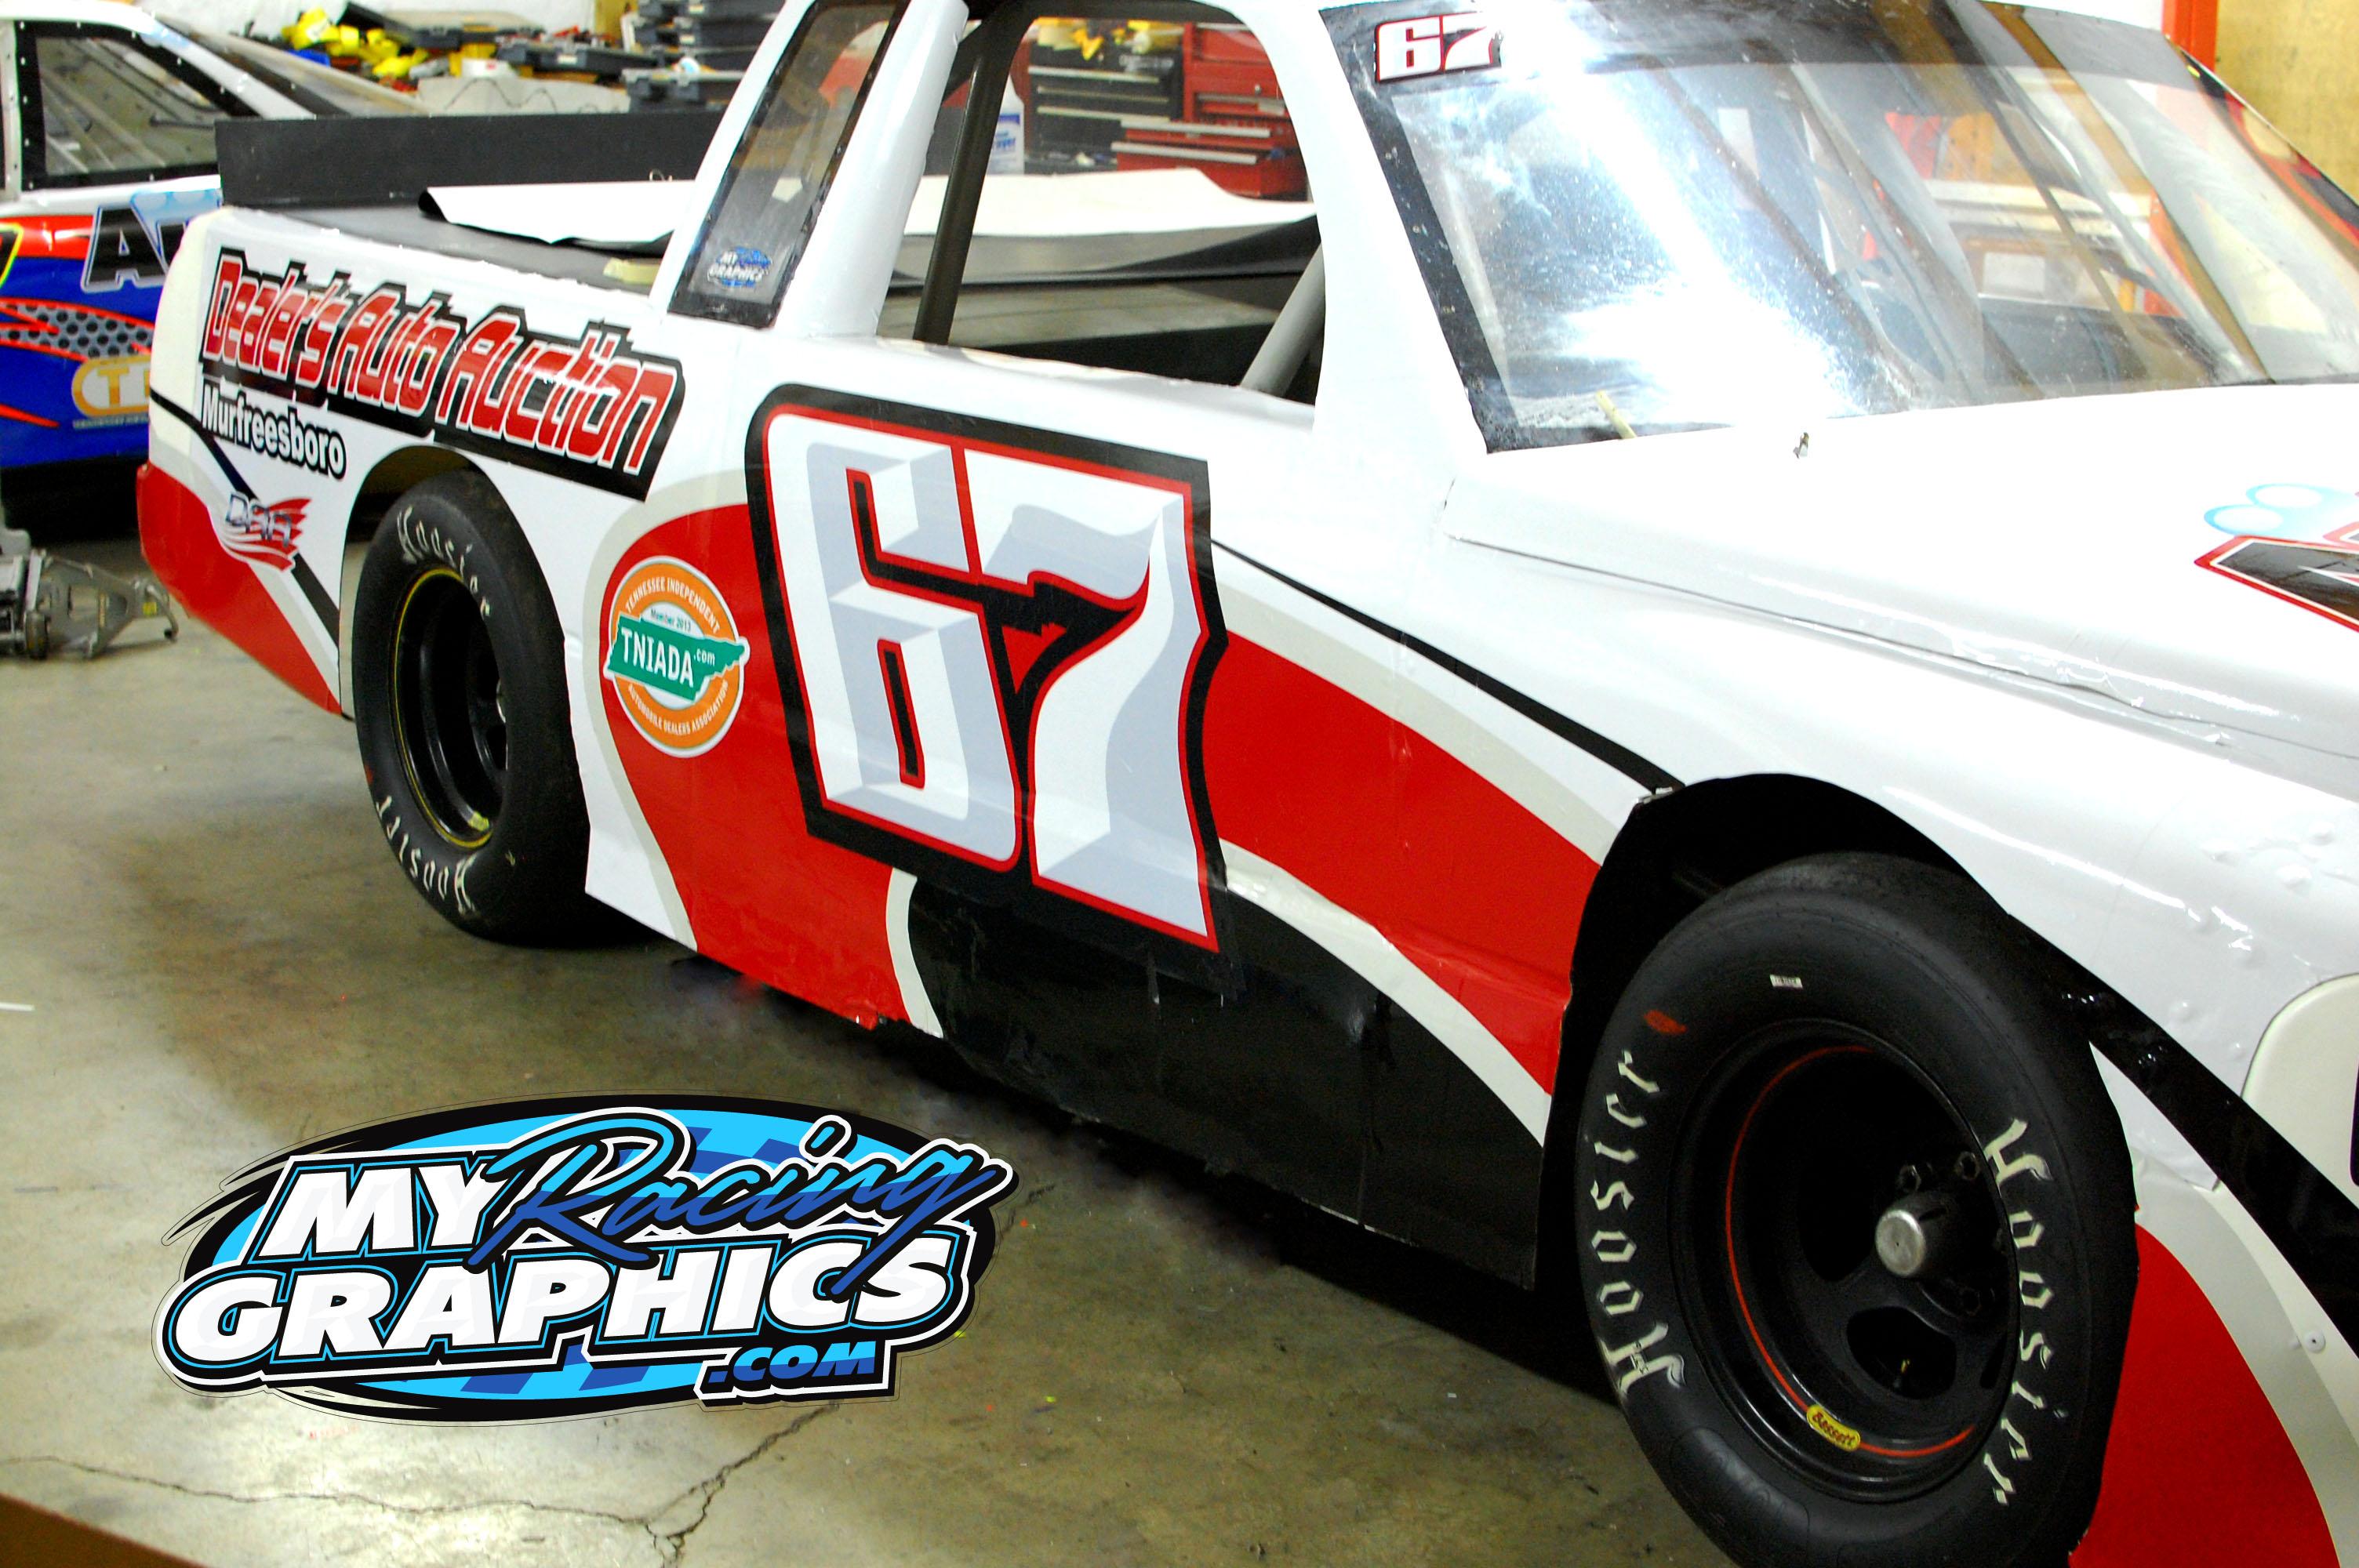 John Earhardt Race Truck Graphics